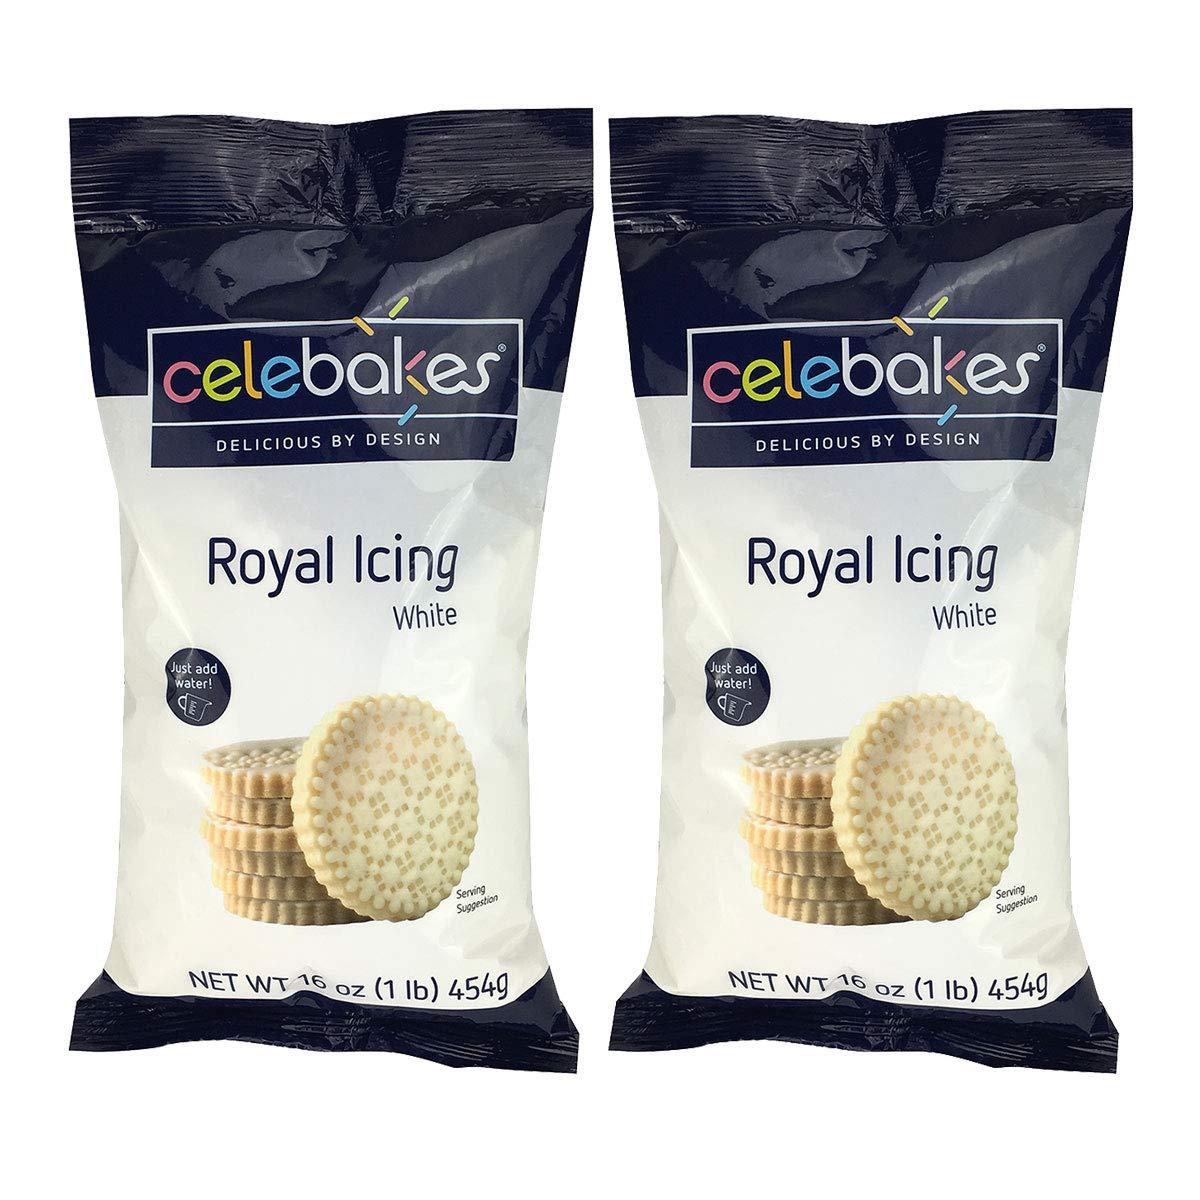 #4 Celebakes Royal Icing Mix